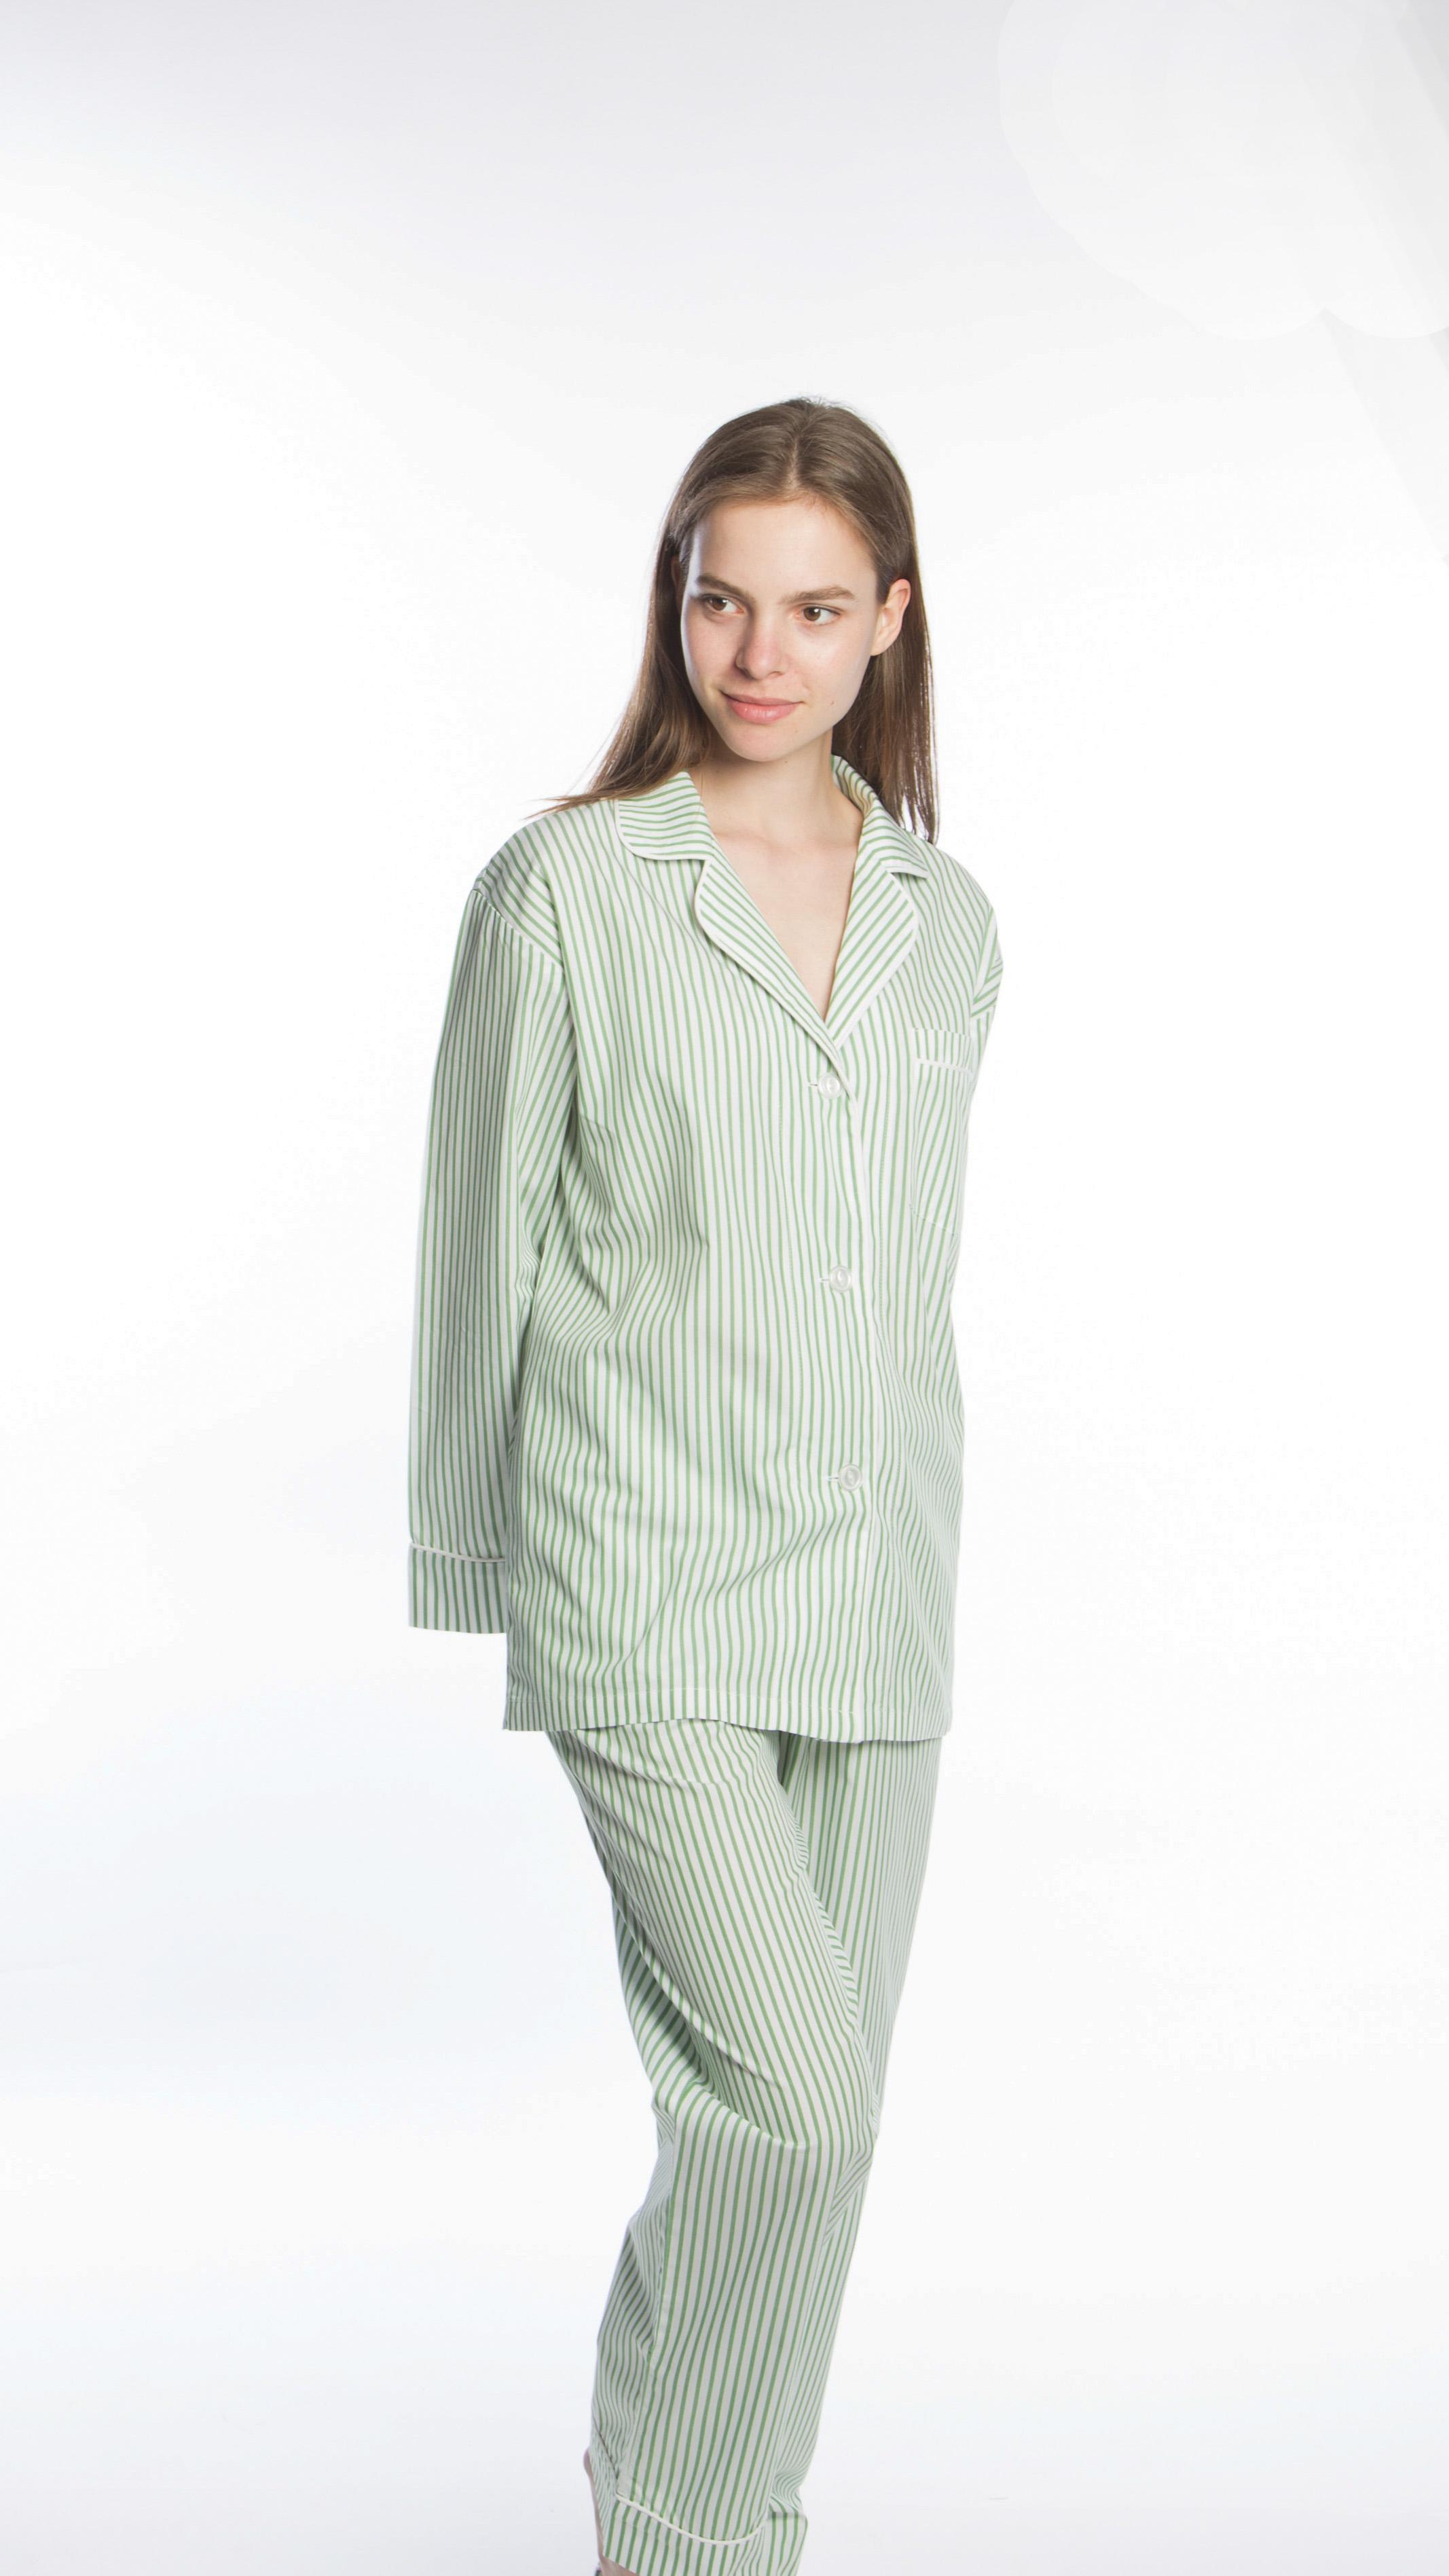 Green Stripe Classic Notch Collar PJ Set - The Pyjama Store bb17ede7097f8